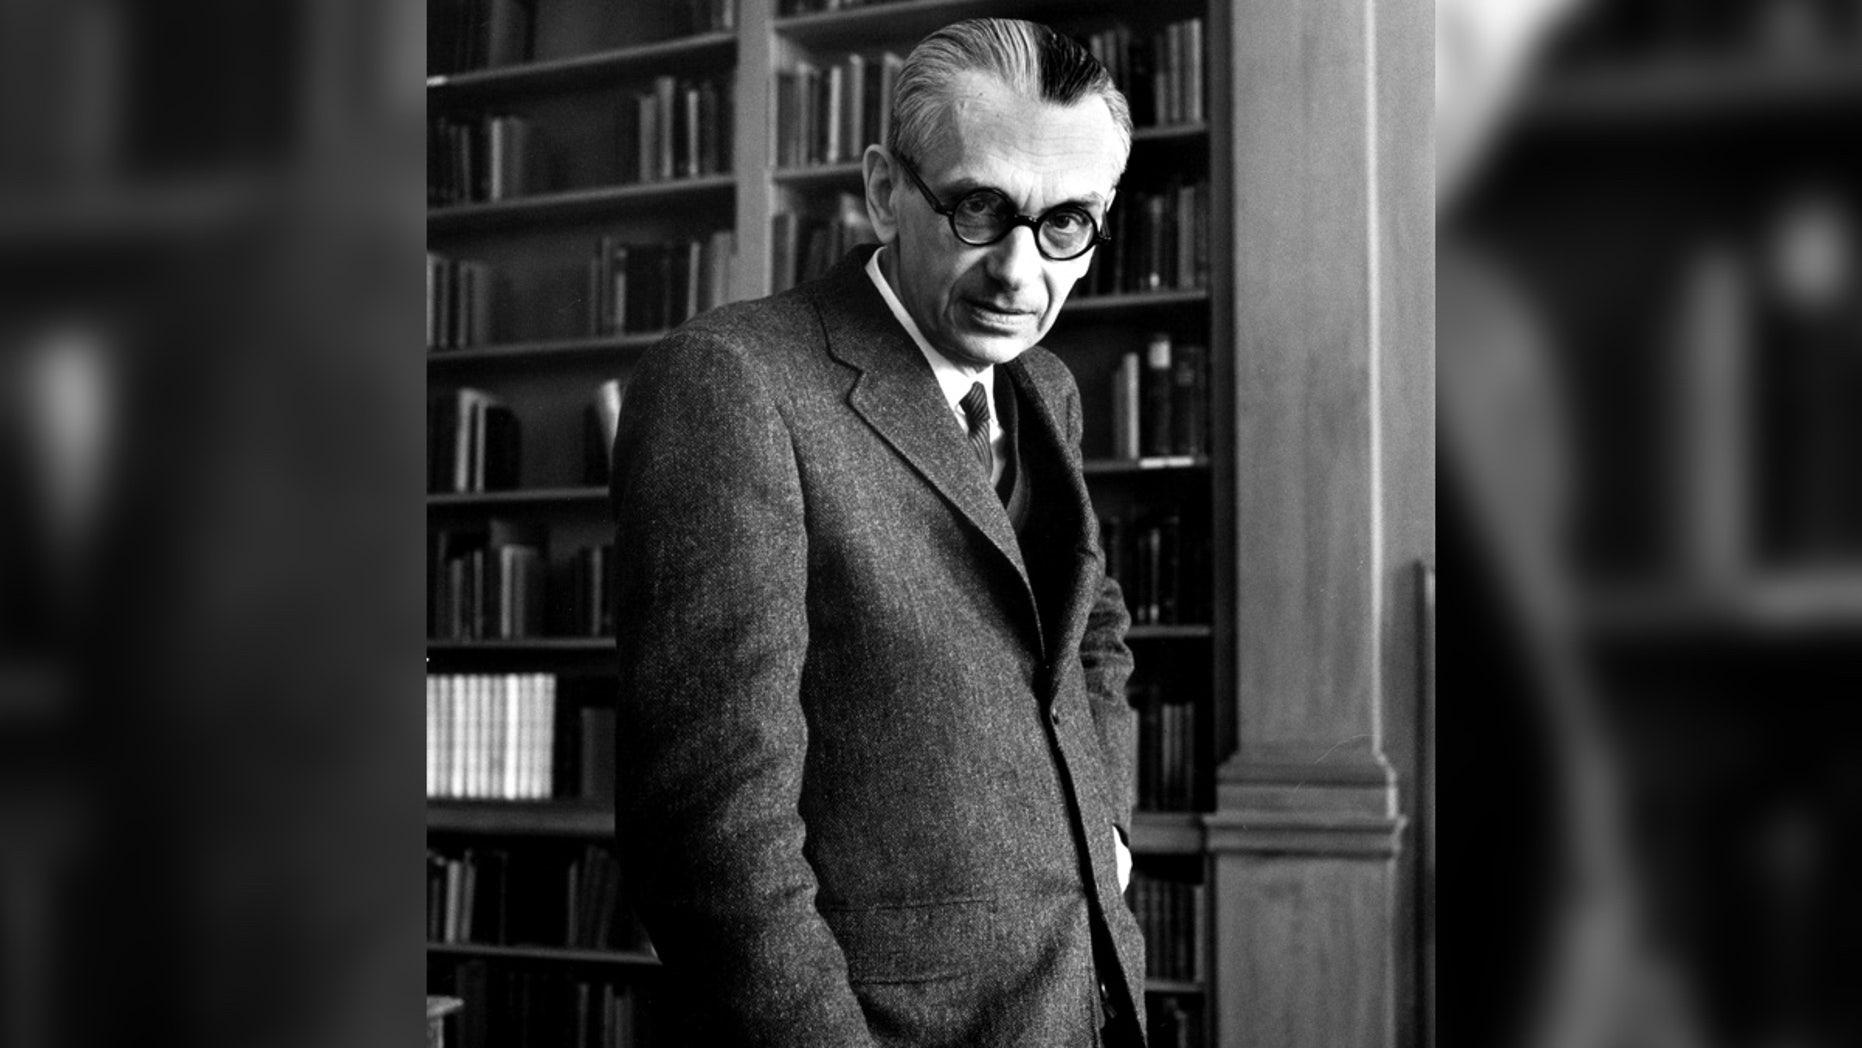 Austrian-born mathematician Kurt Godel during a Institute of Advanced Study.